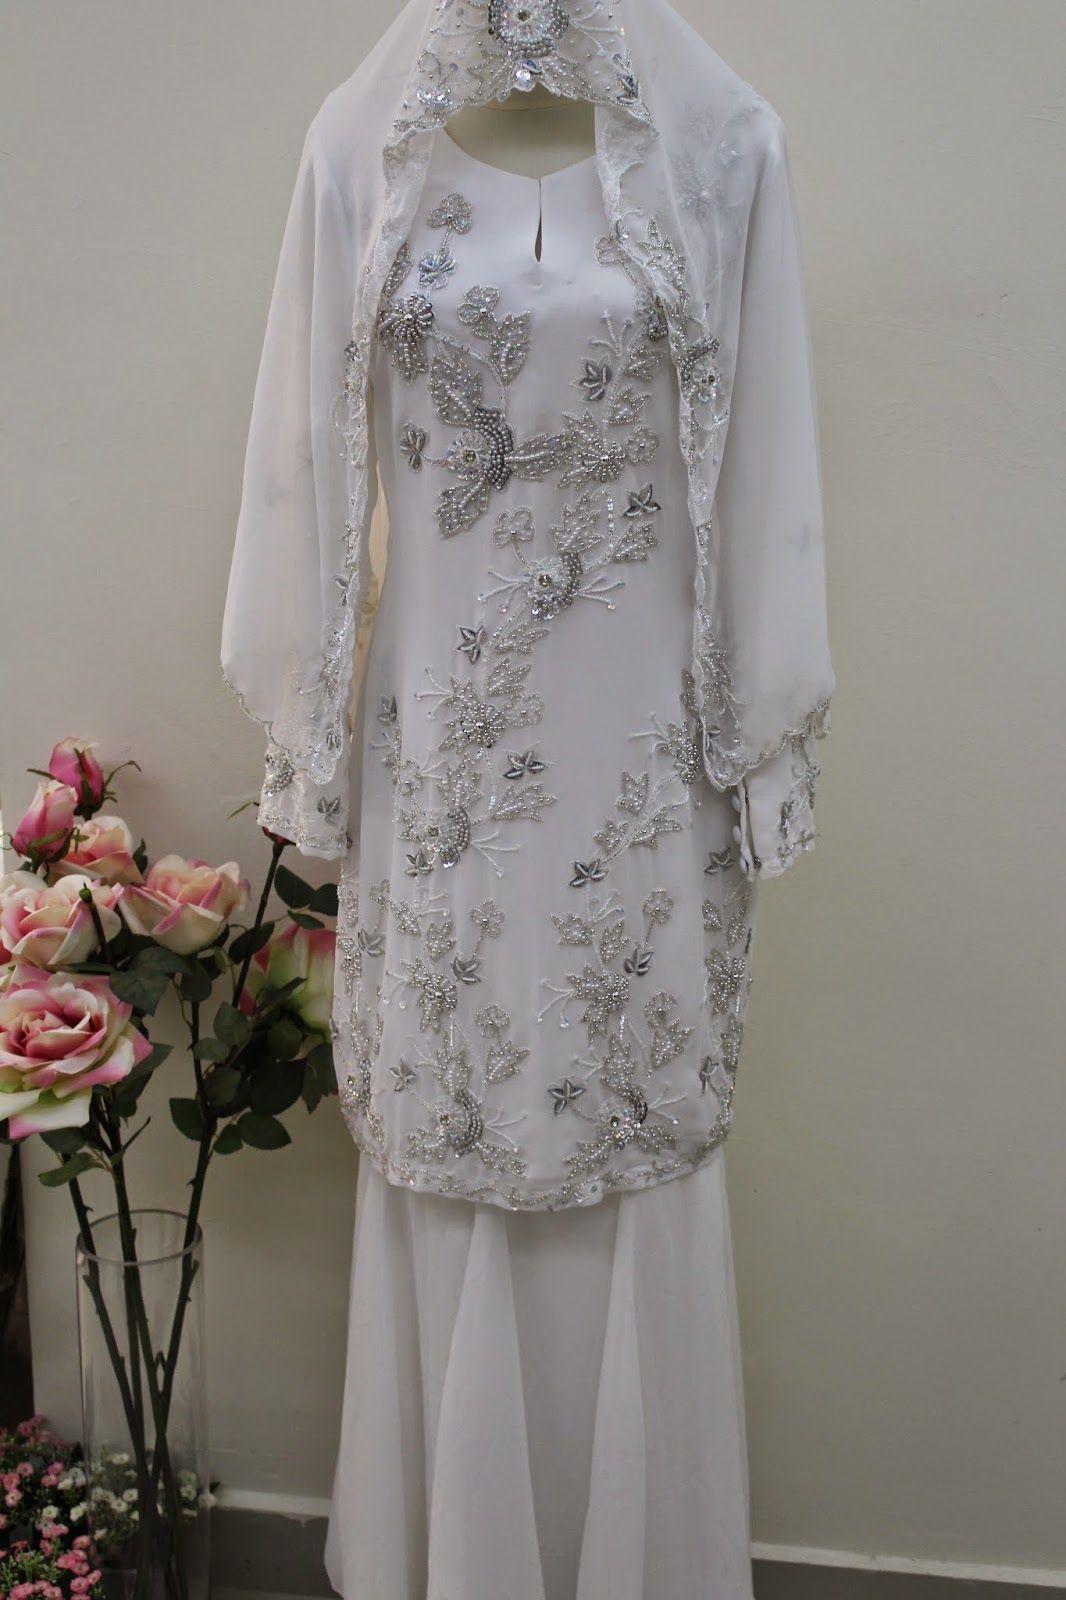 sewa baju pengantin dan andaman zahra kurung moden putih